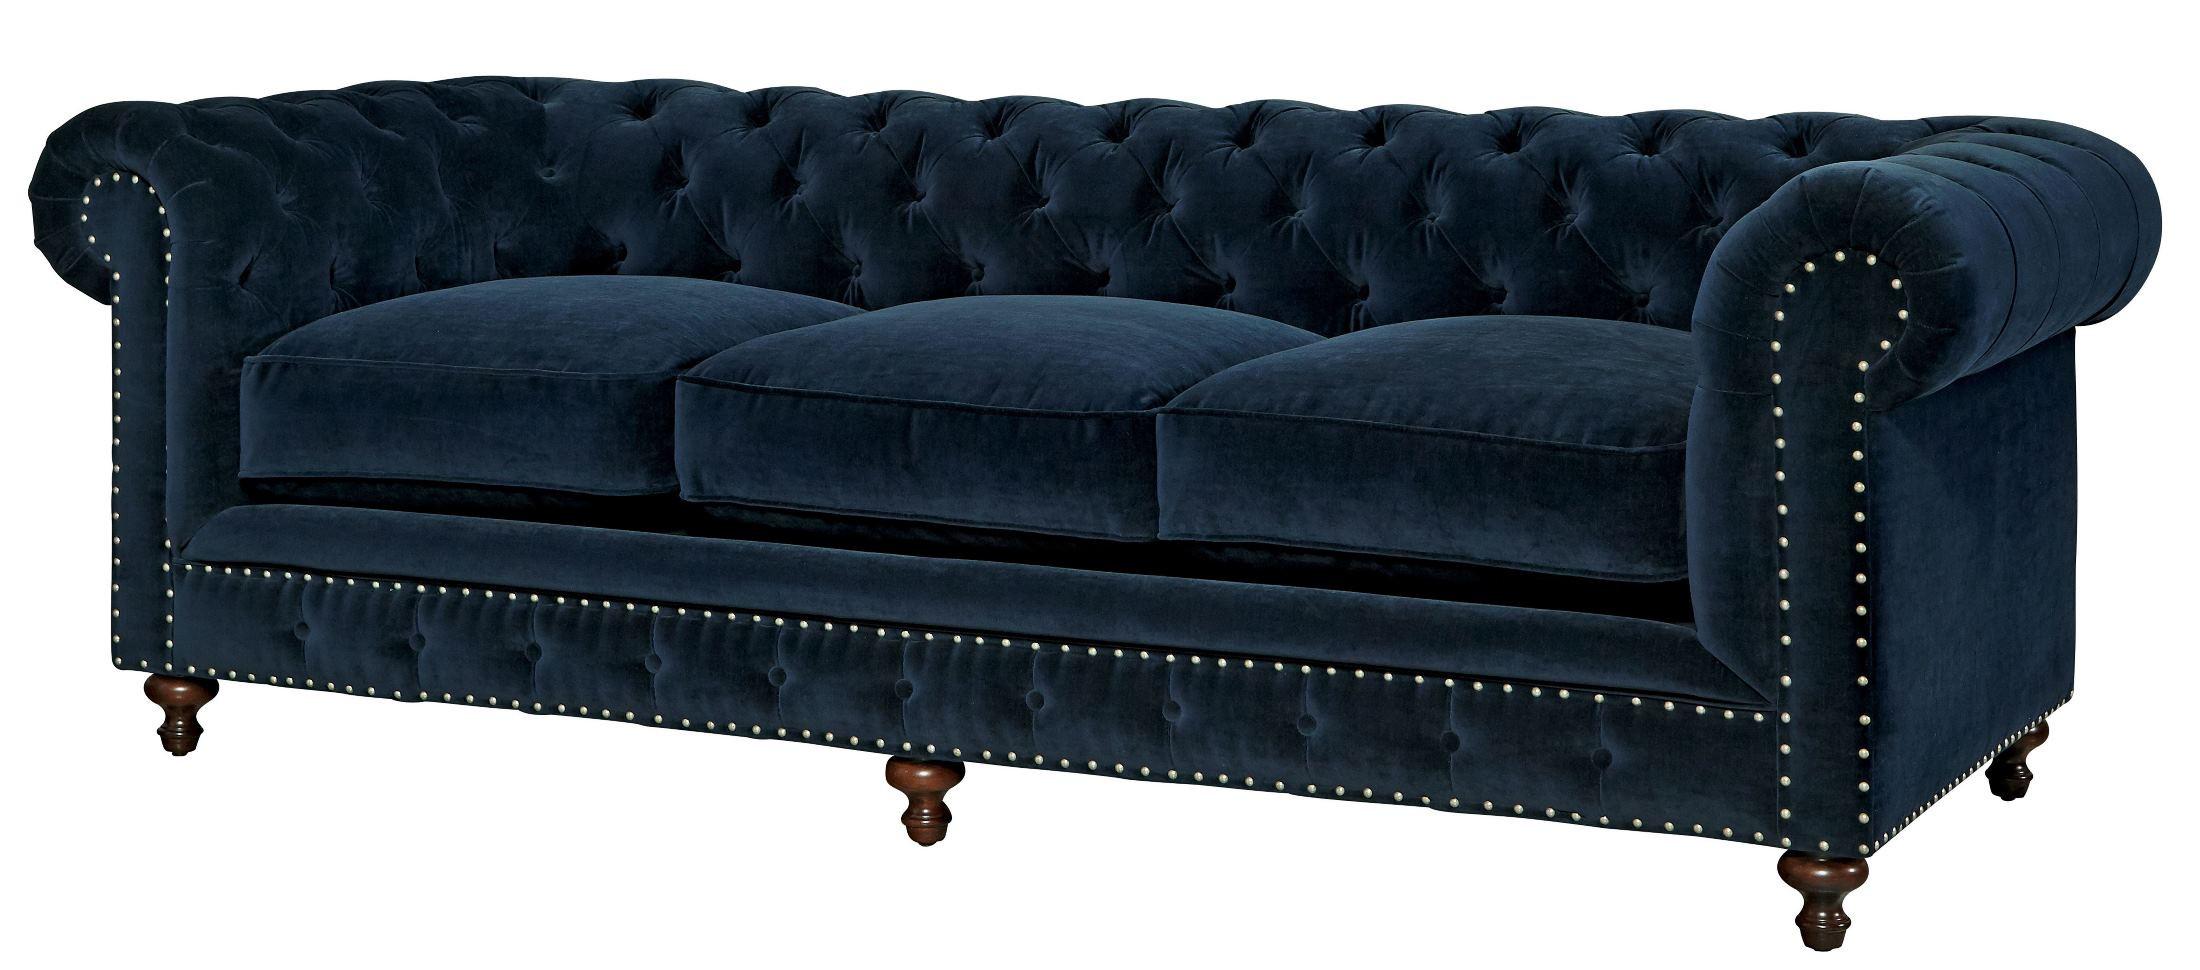 Best ideas about Blue Velvet Sofa . Save or Pin Universal Berkeley Sumatra Blue Velvet Sofa Berkeley Now.